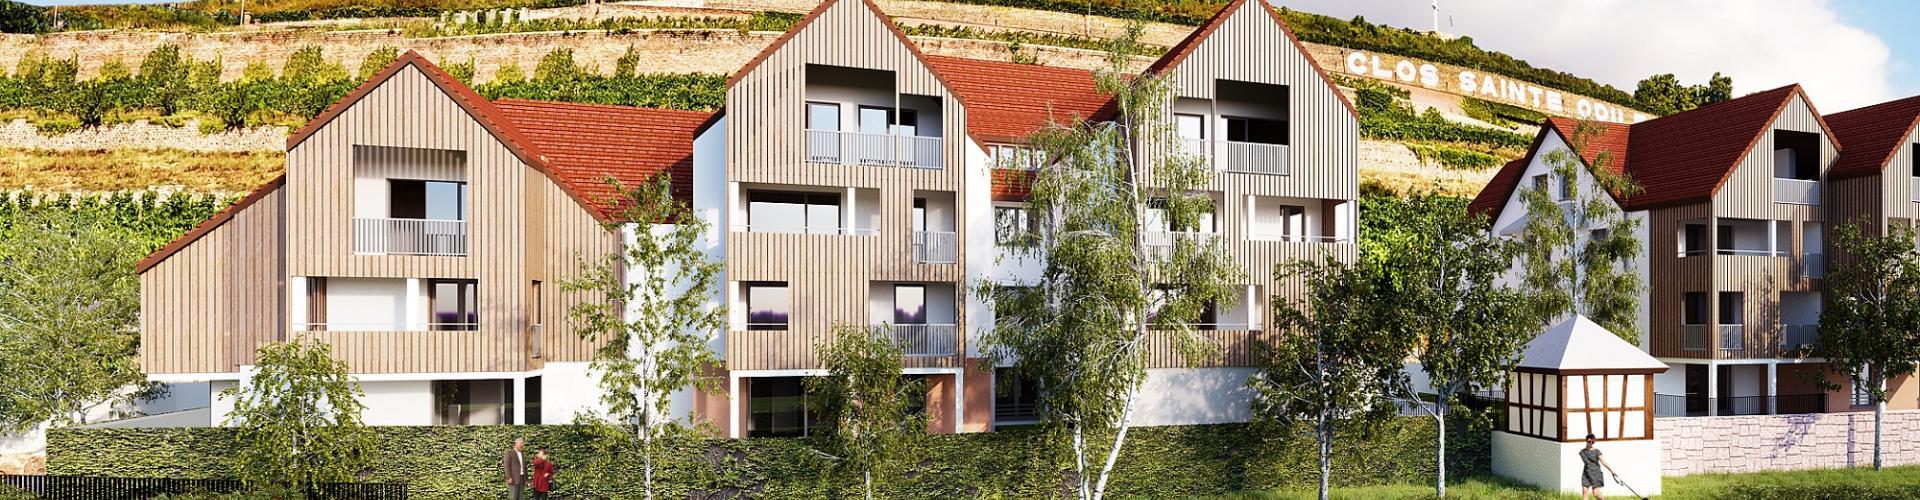 Programme immobilier neuf Obernai - Séduction